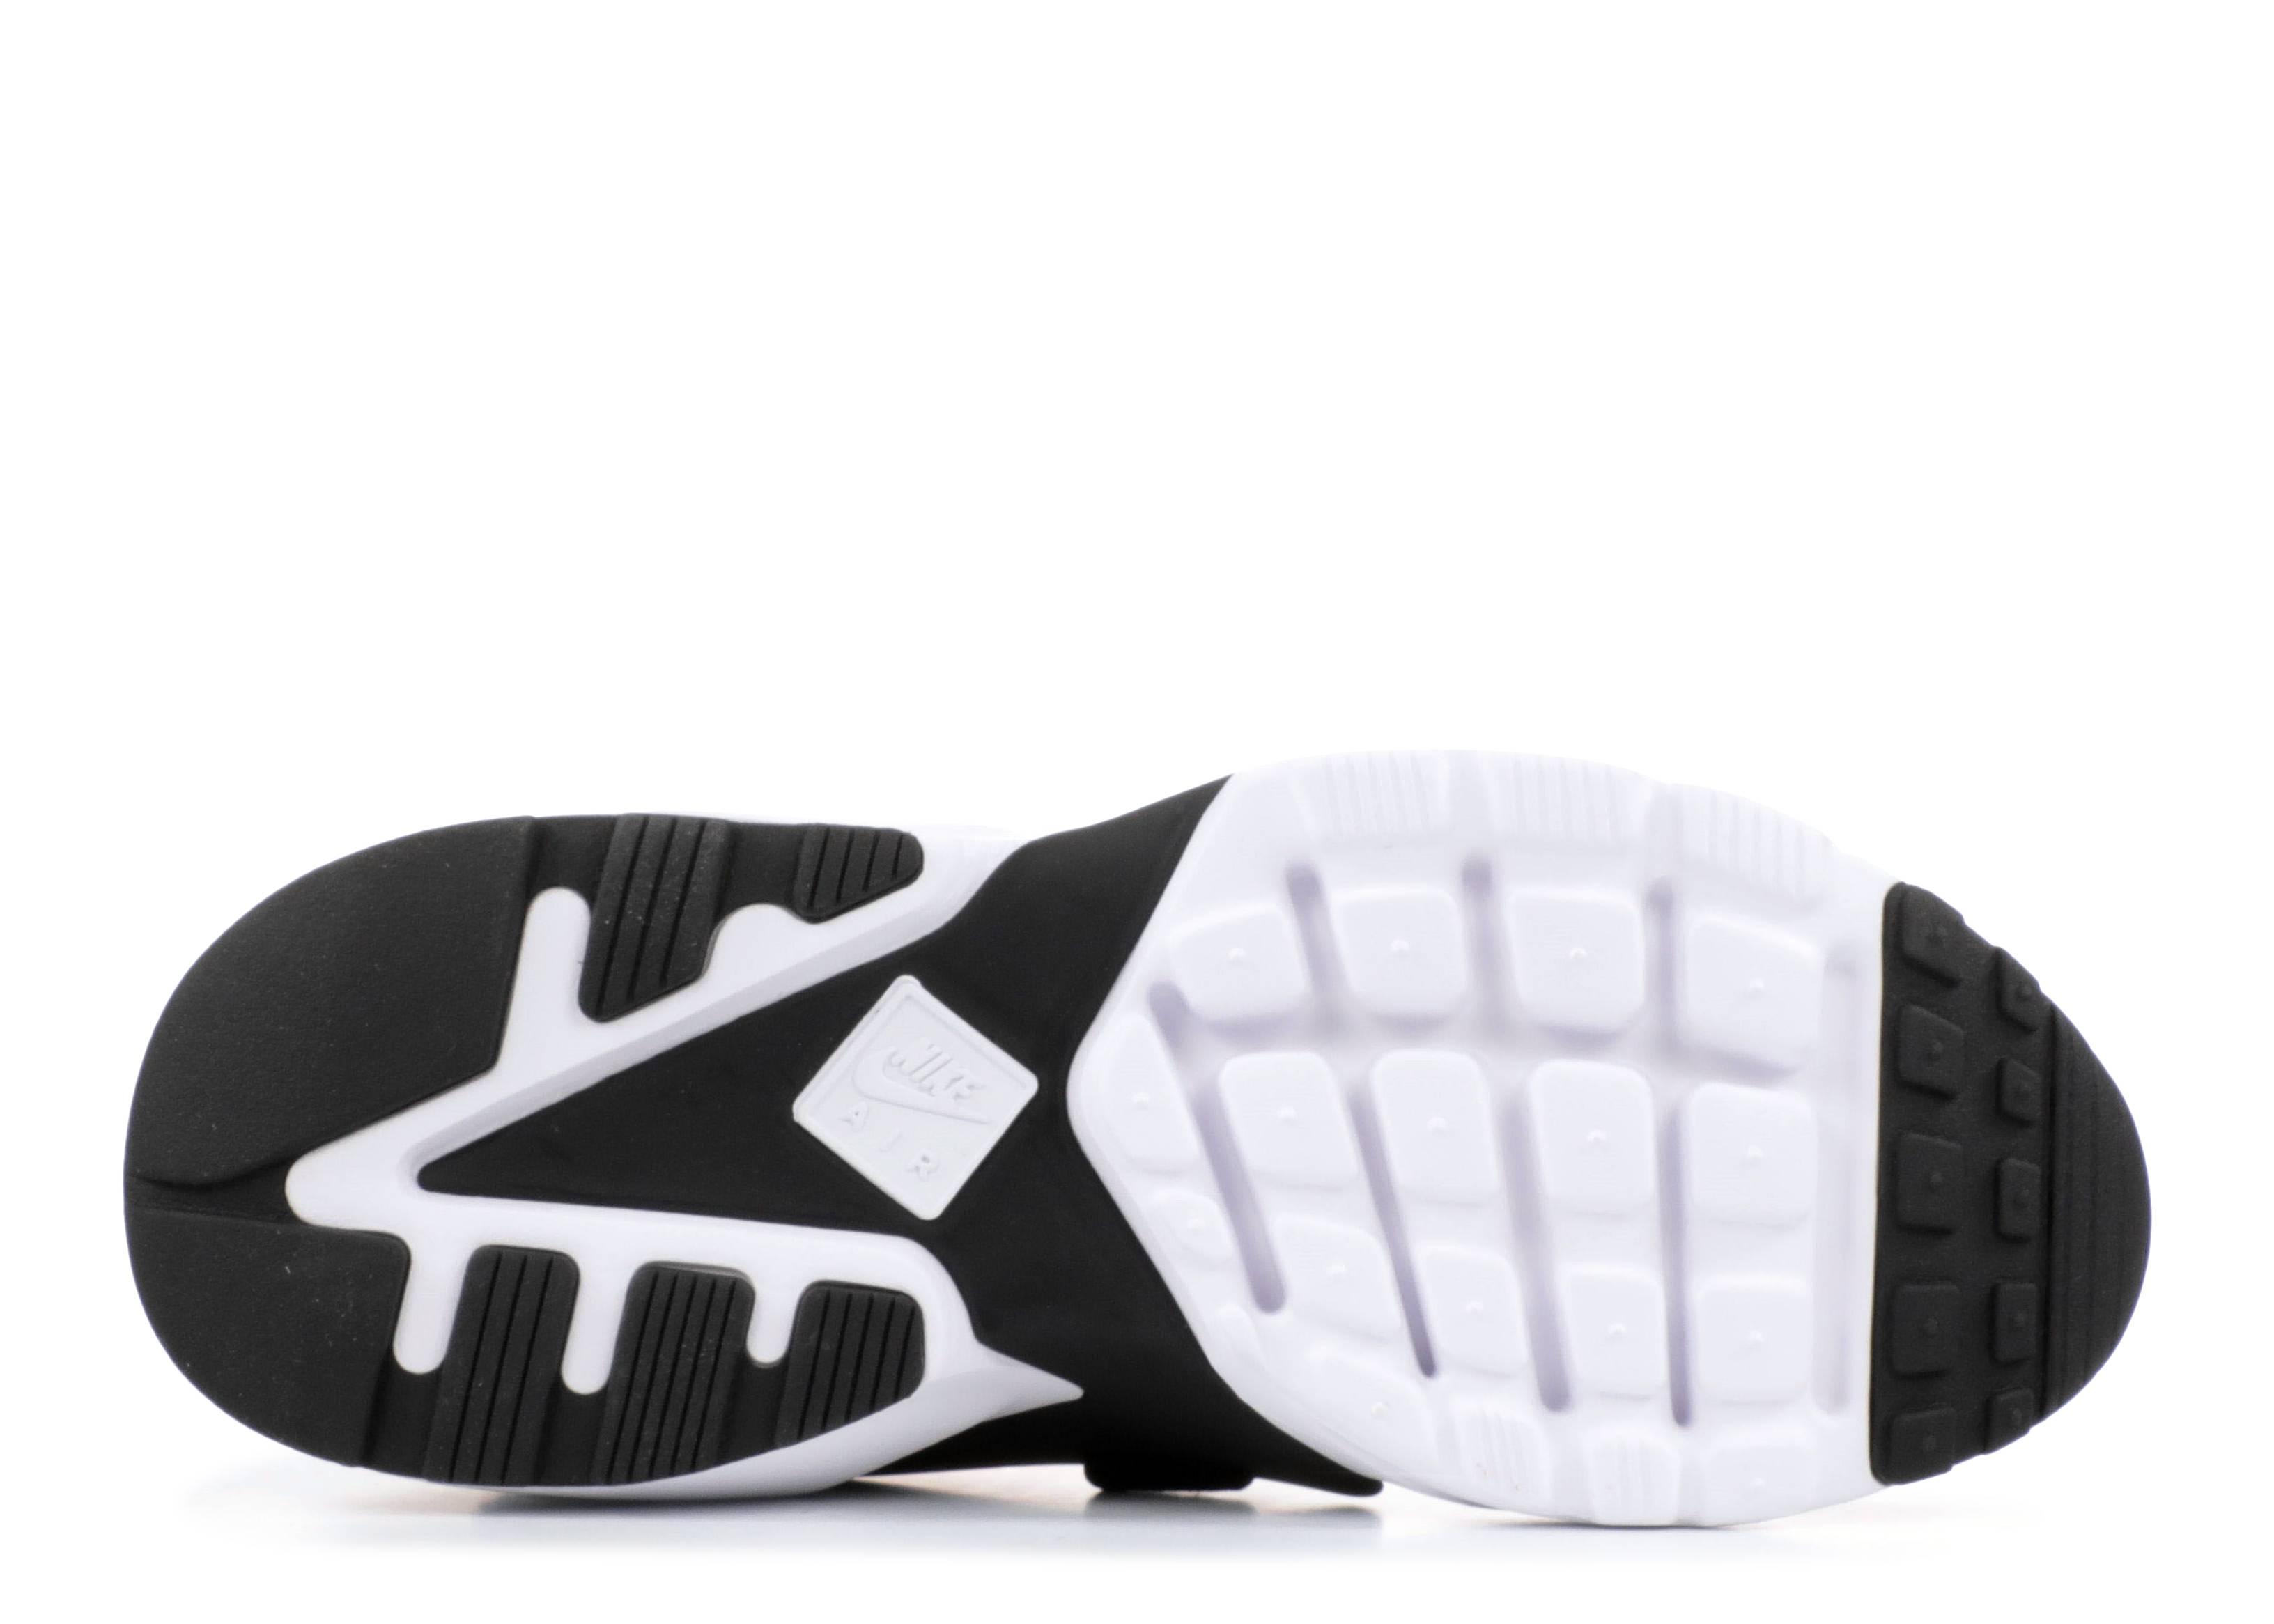 515f283e4d39f W Nike Air Huarache City - Nike - ah6787 400 - bleached aqua black ...